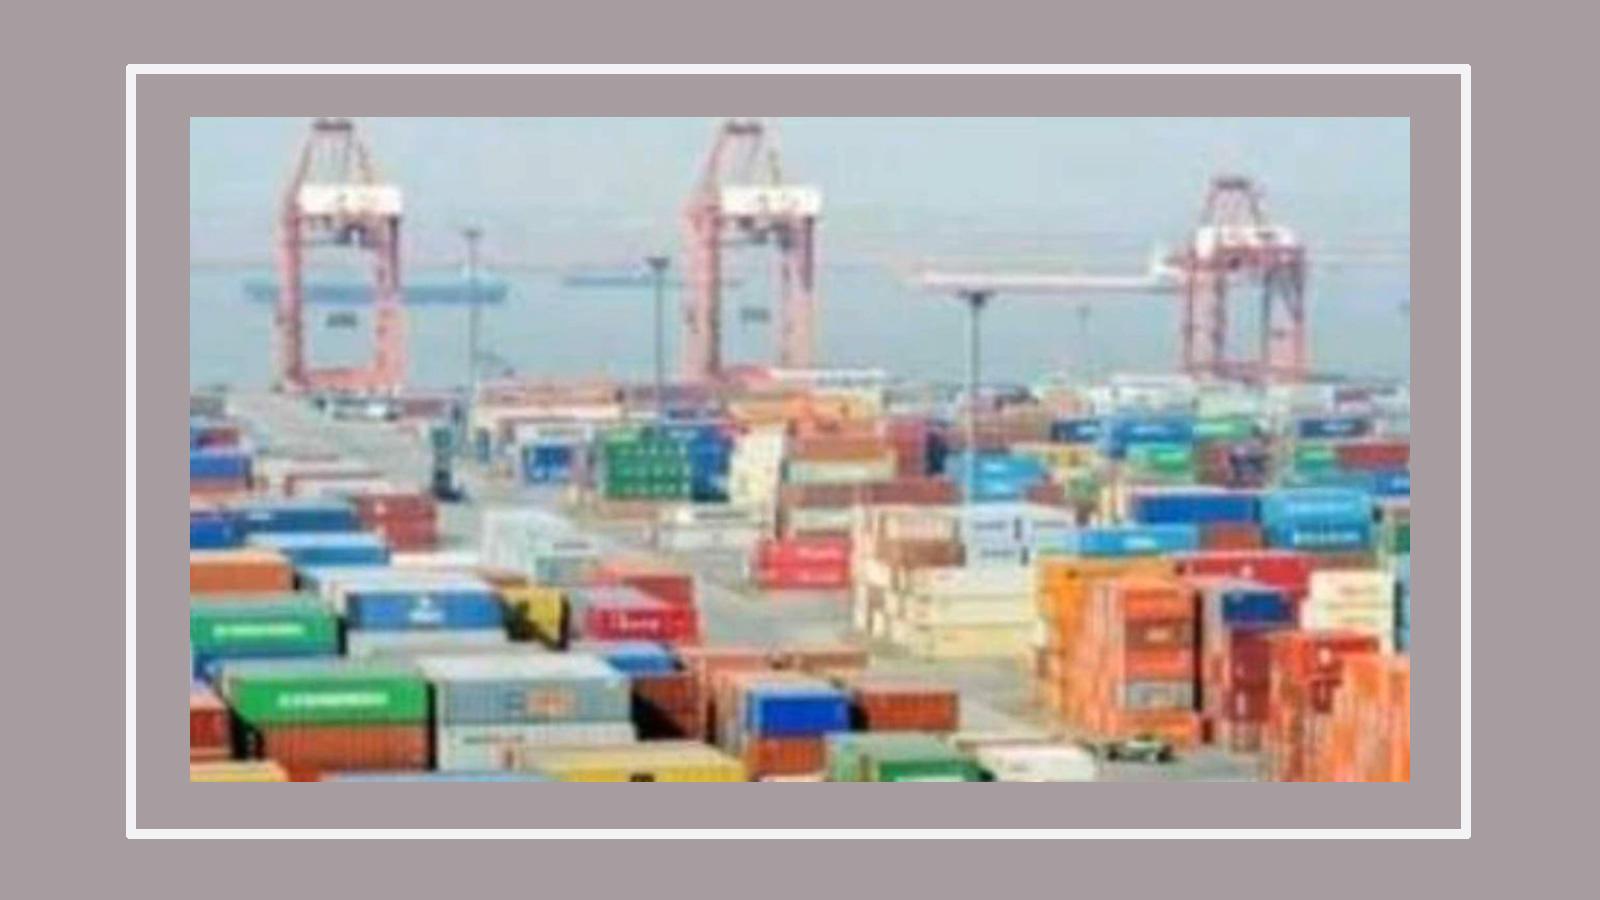 indias-exports-hit-record-in-fy19-surpass-earlier-fy14-peak